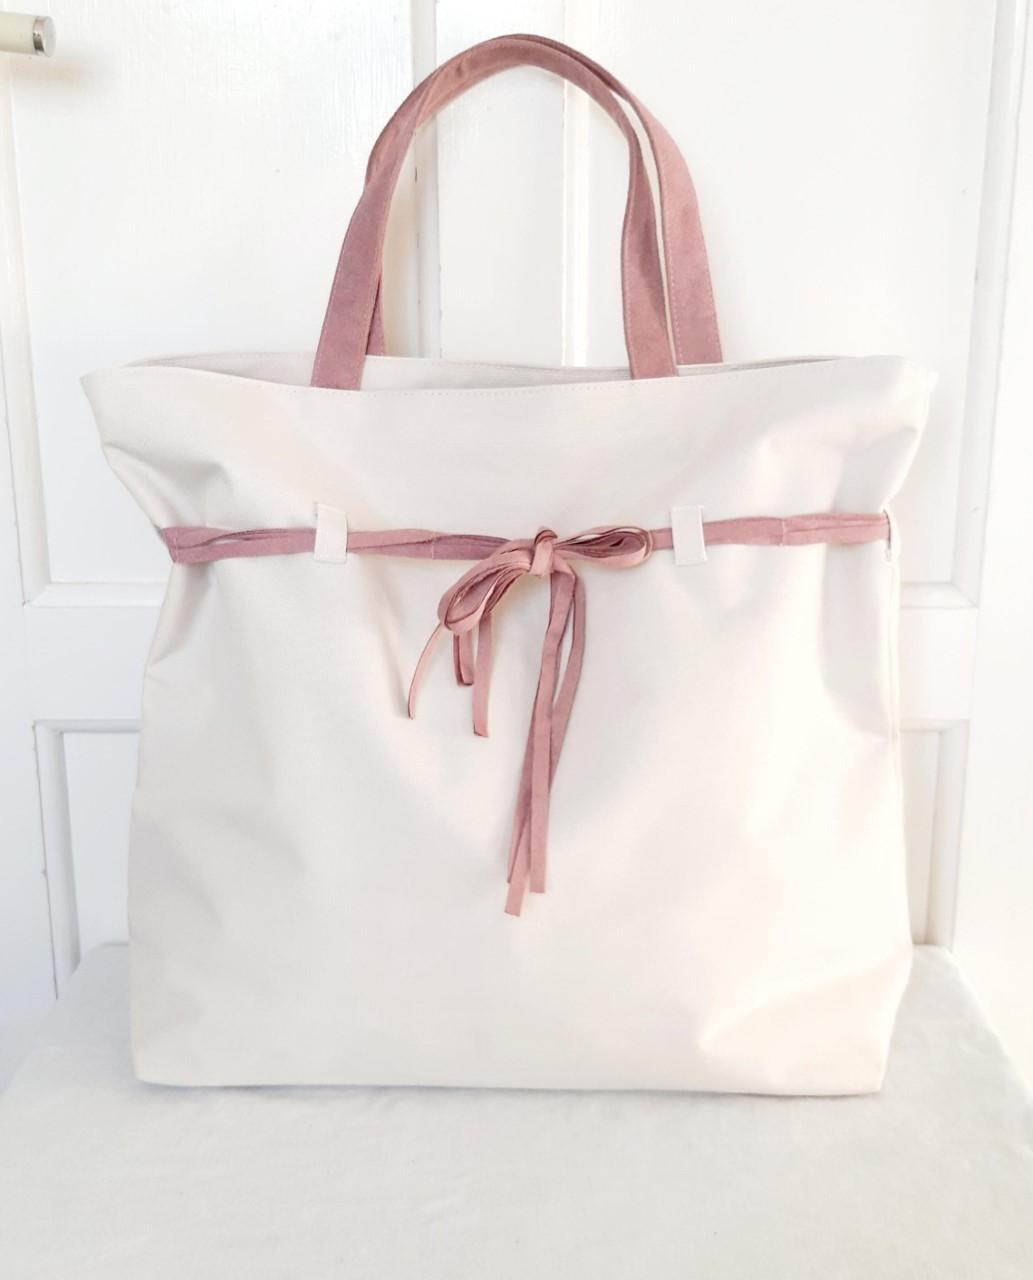 Beige stor väska Lancome weekendbag handväska dam äkta mocka rosa band Nyskick!